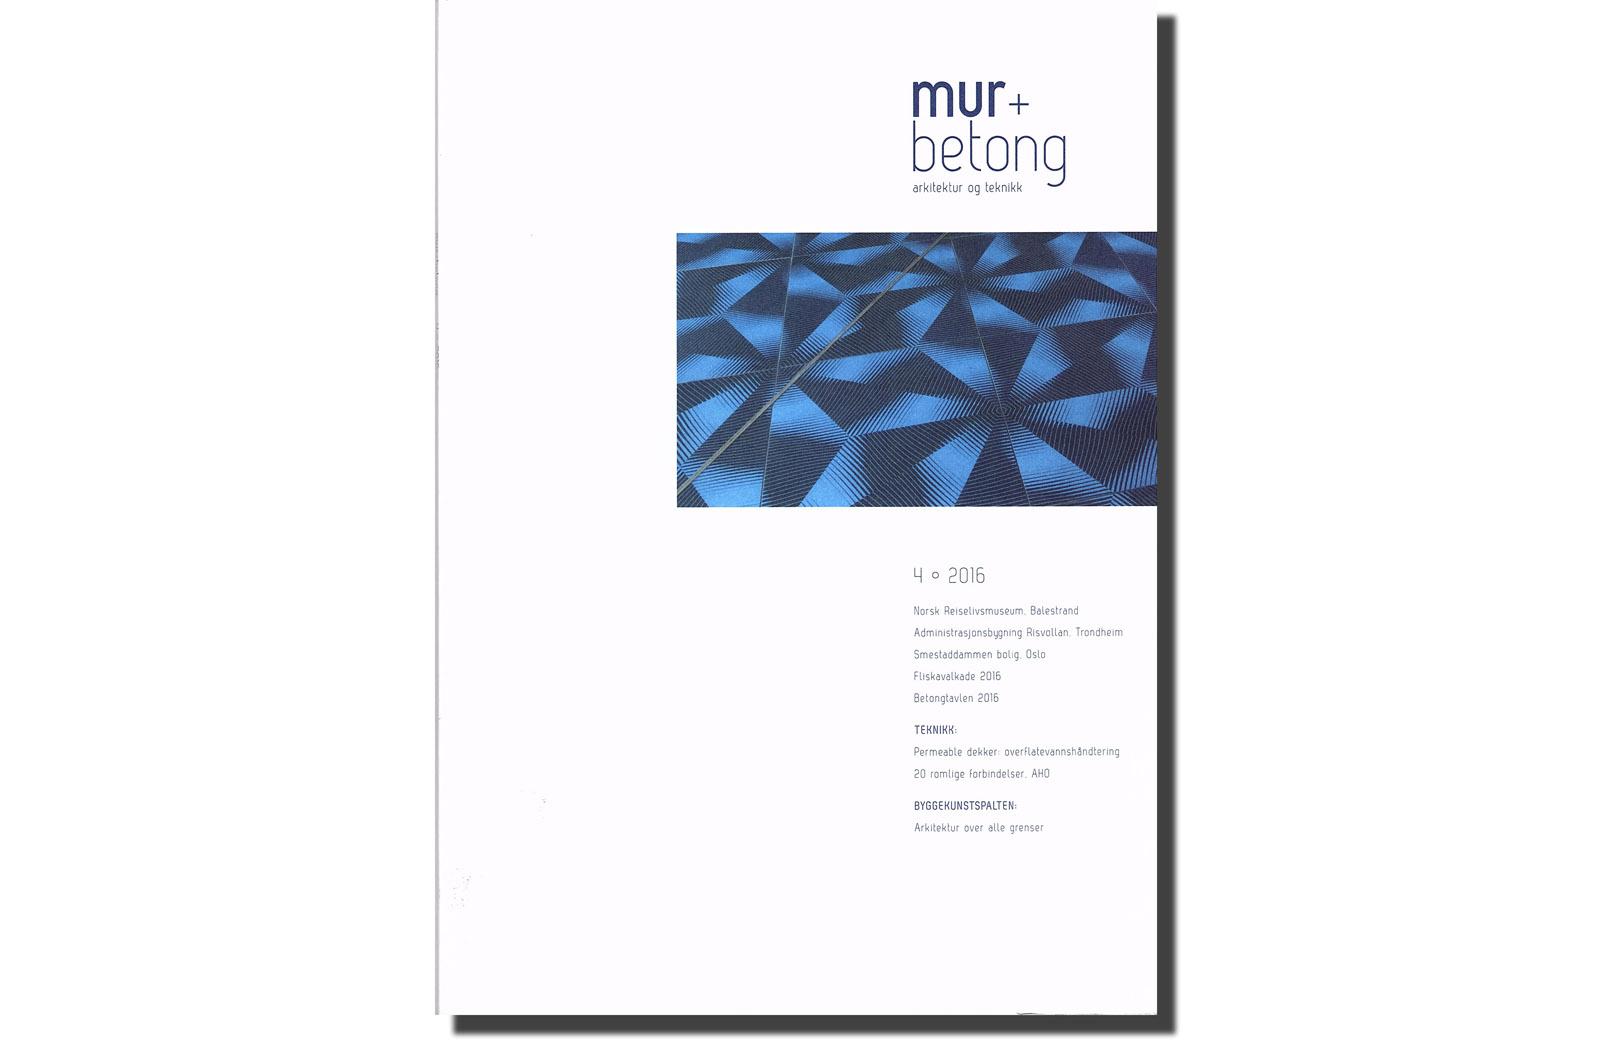 murbetong_mm-house_portada